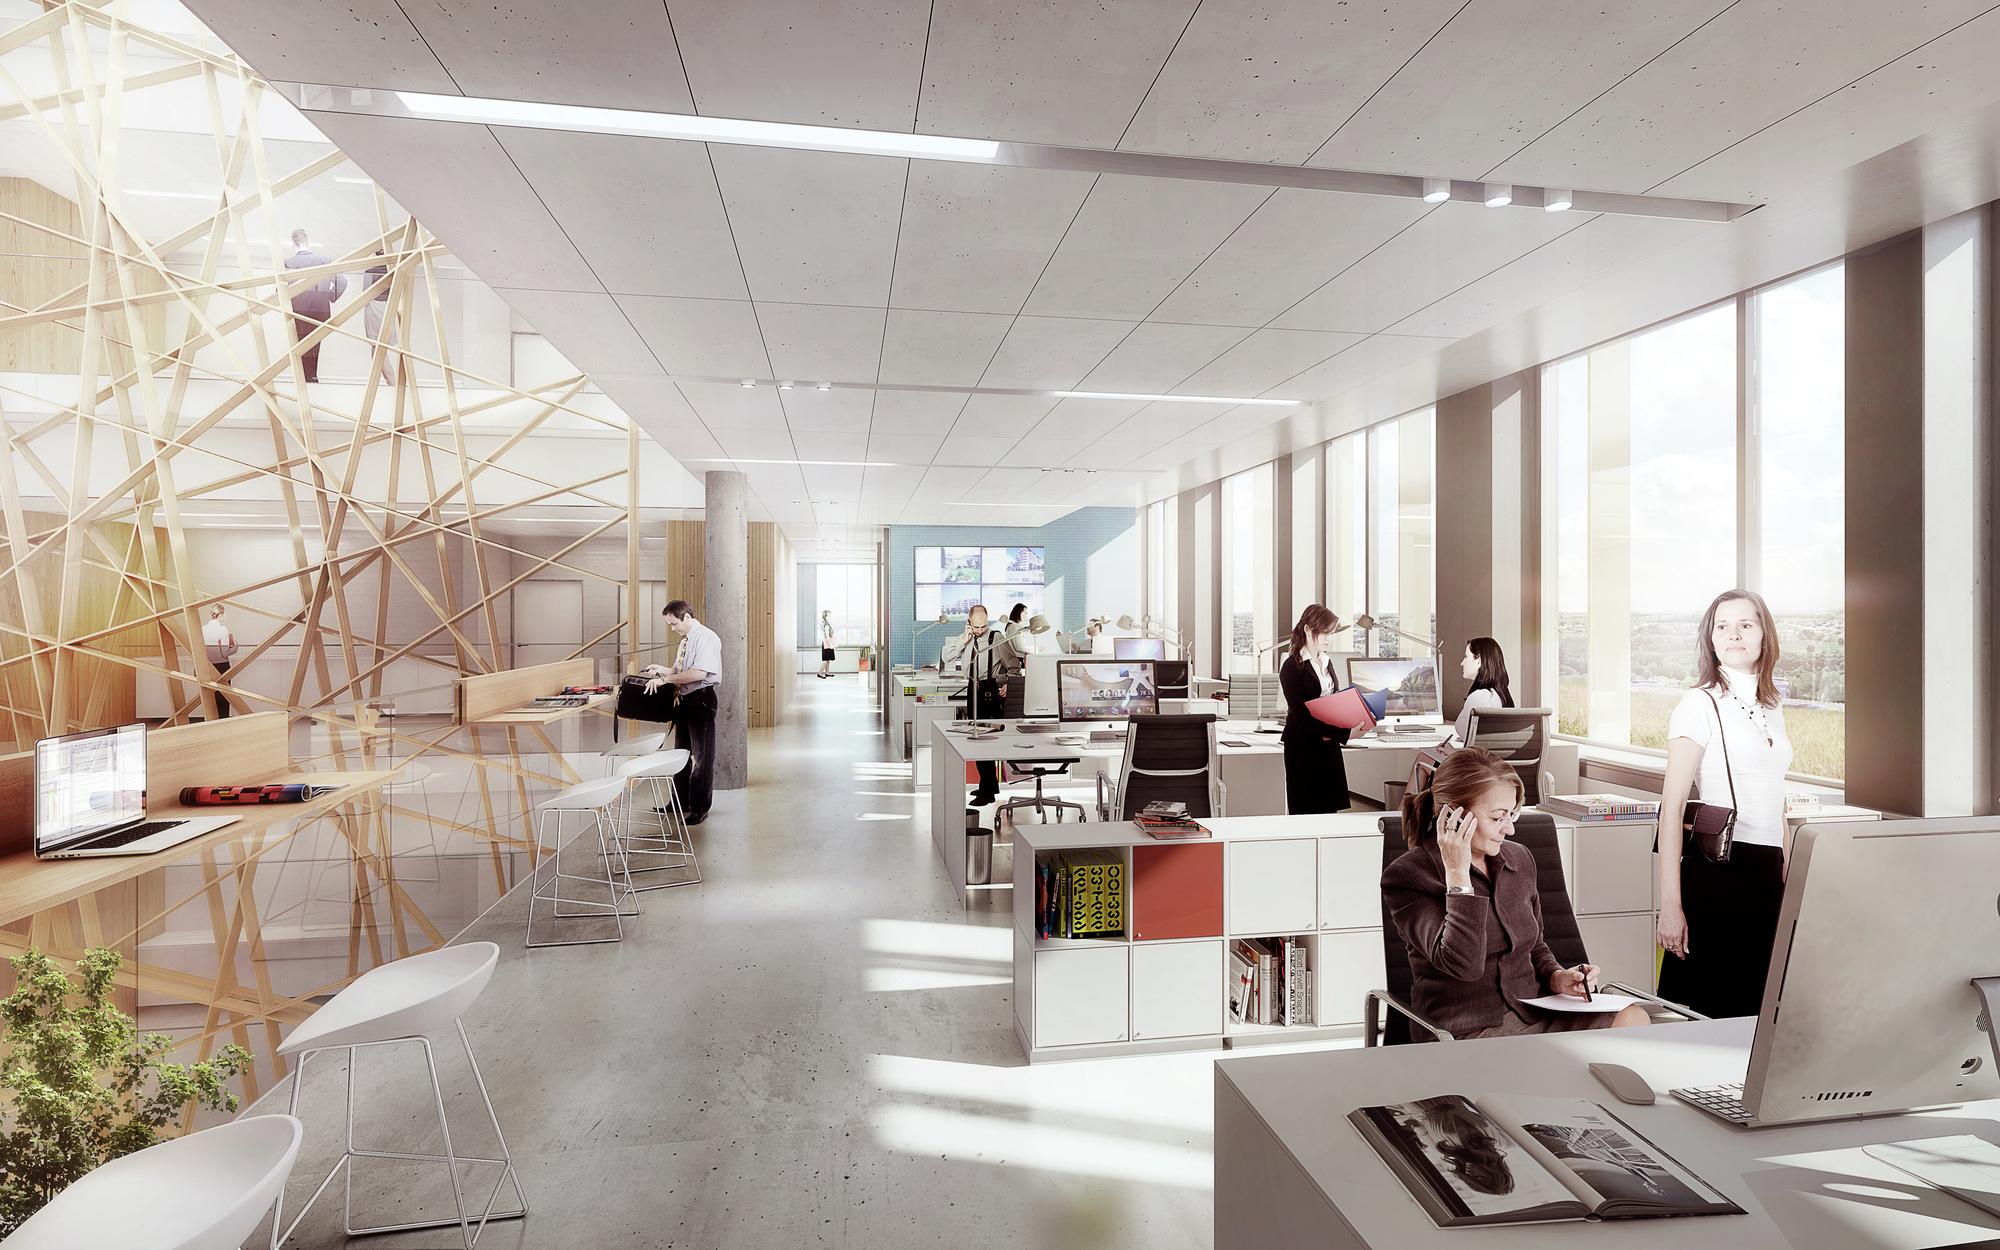 Galeria de arkitema projeta edif cio de escrit rios para a for America s top interior designers